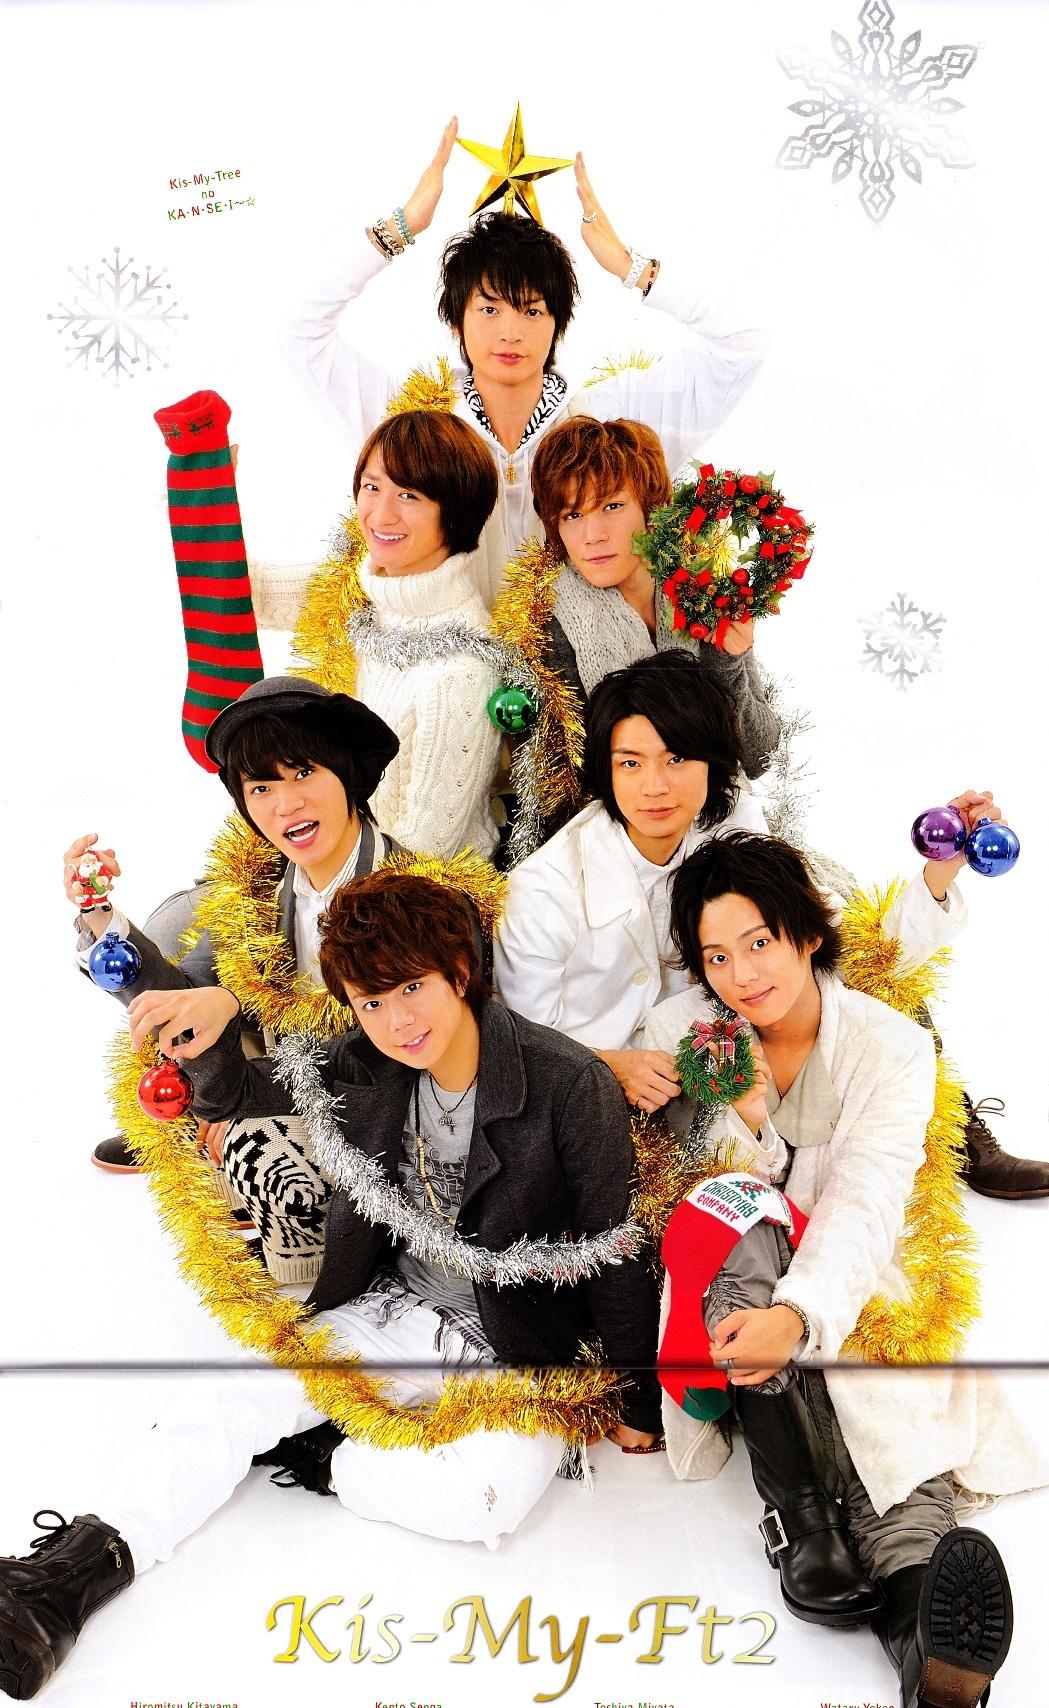 Kisumai Merry X'mas